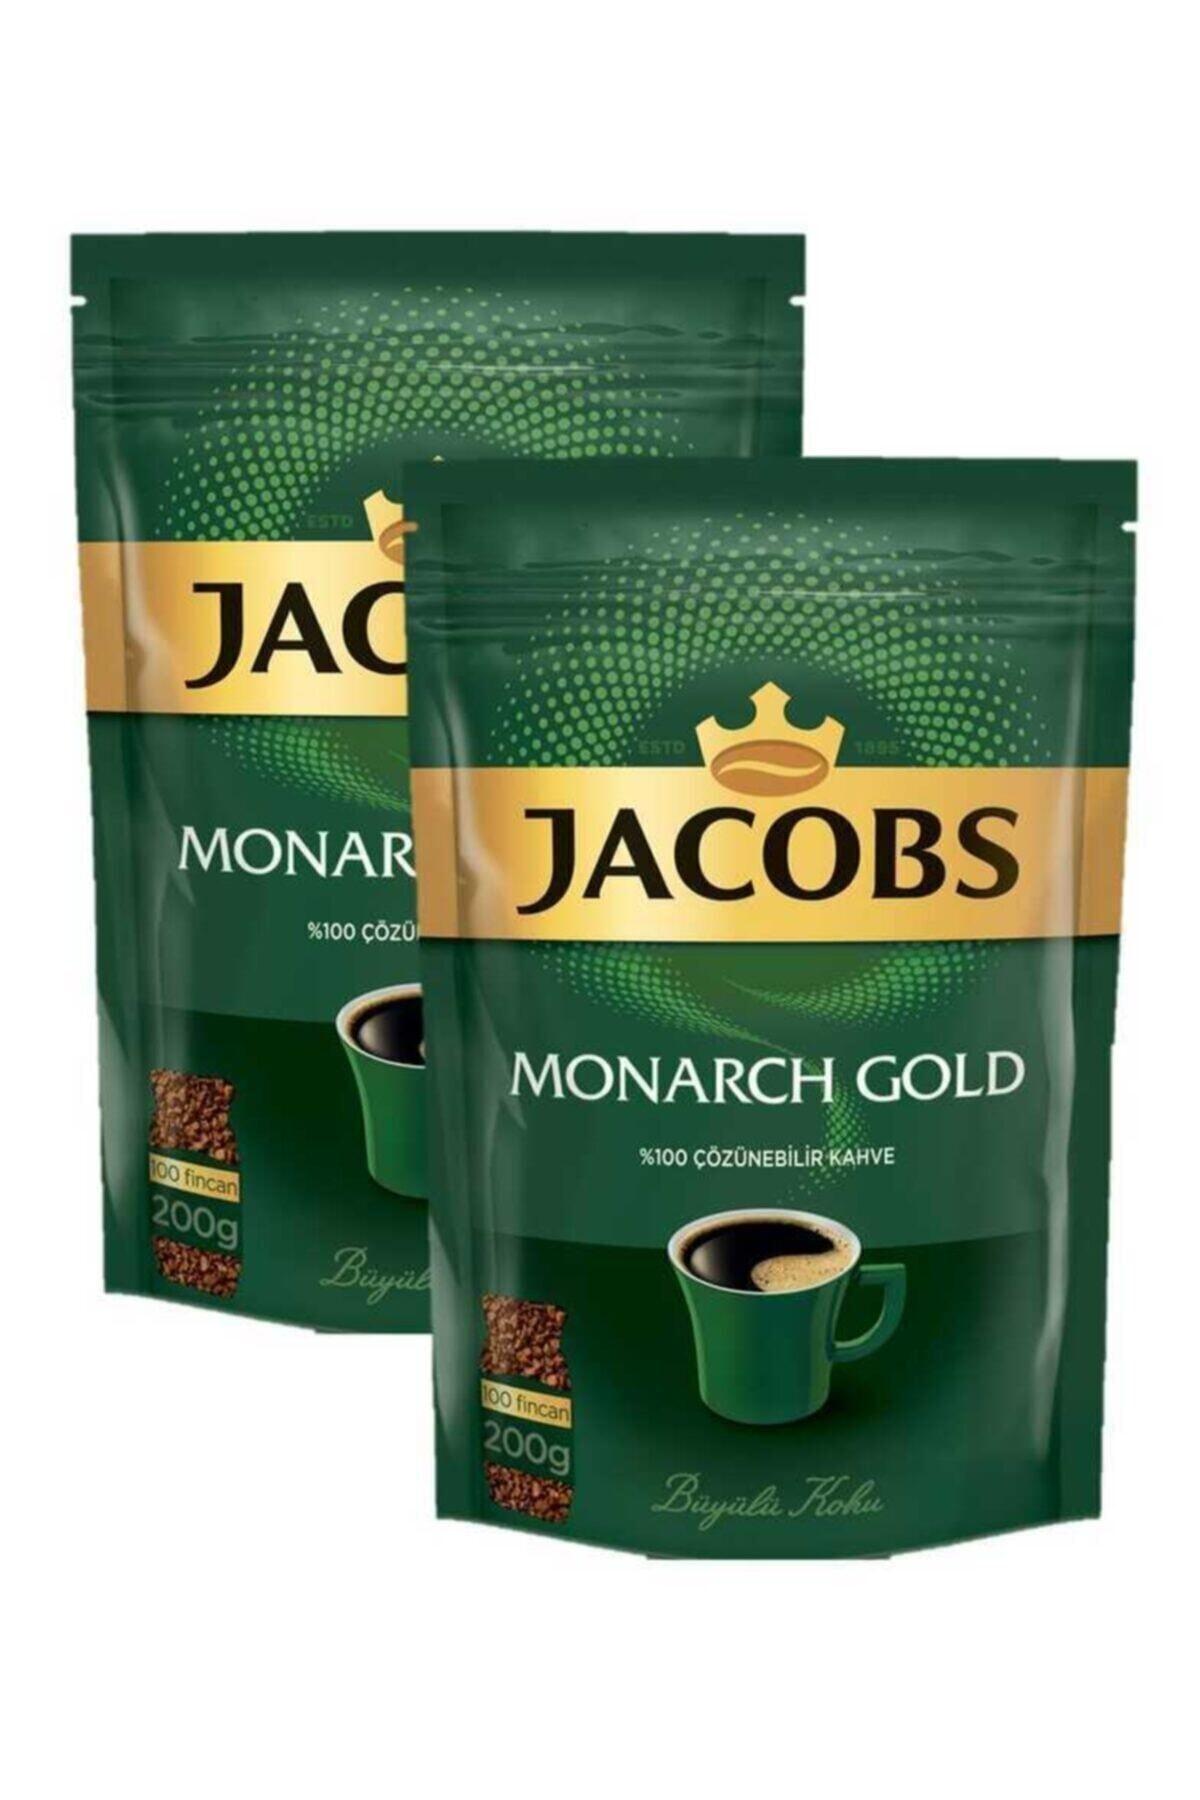 Jacobs Monarch Gold Kahve 400gr (200 gr X 2) Ekonomik Paket 1